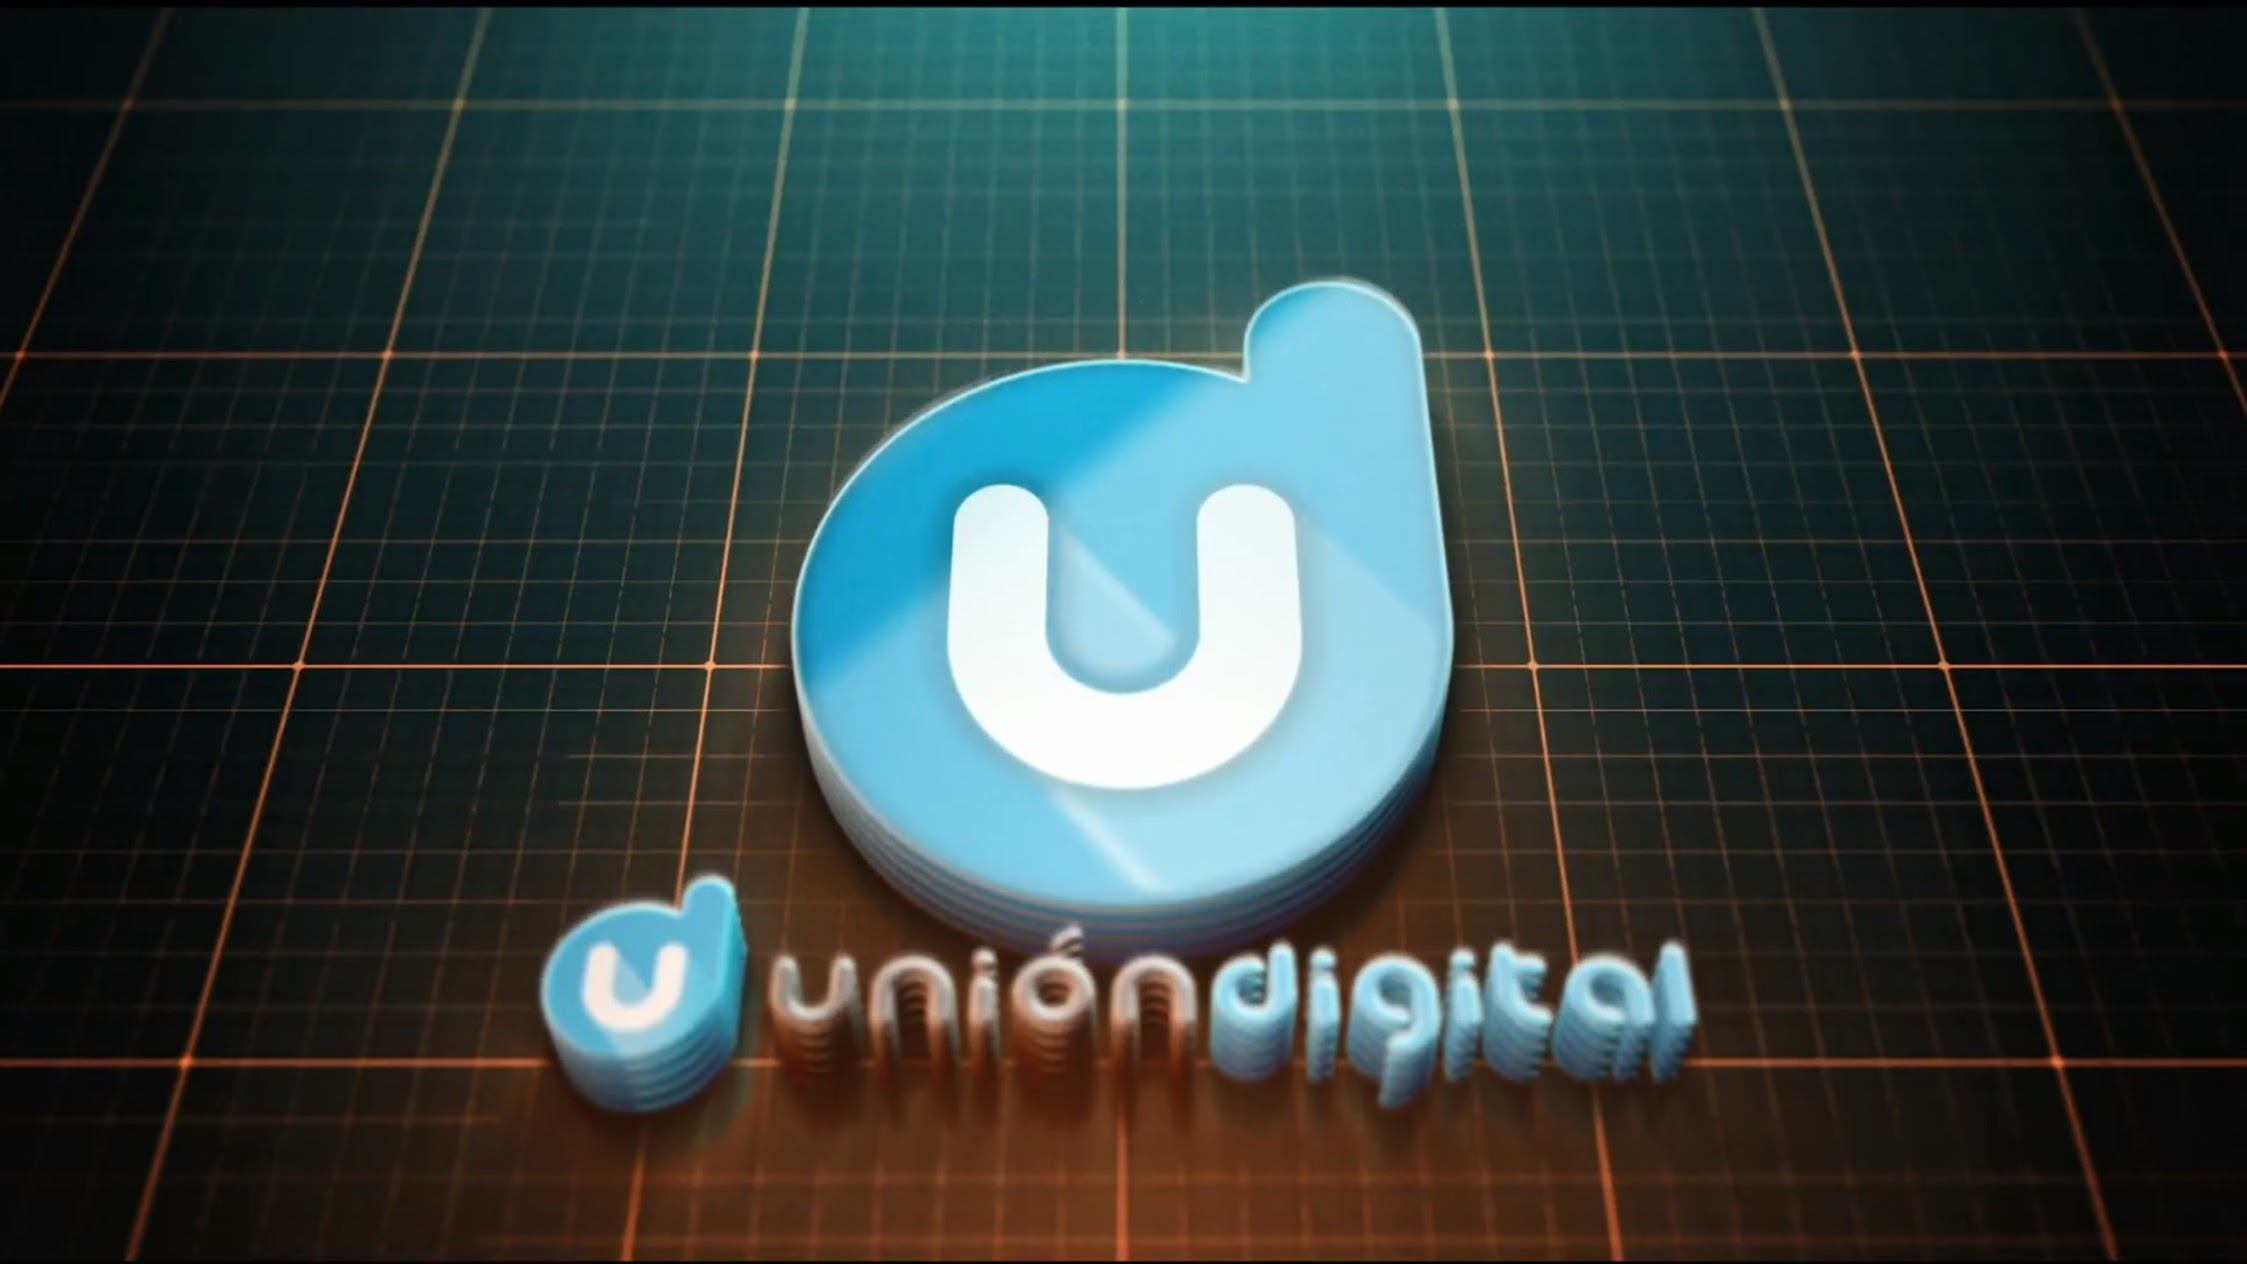 Union Digital